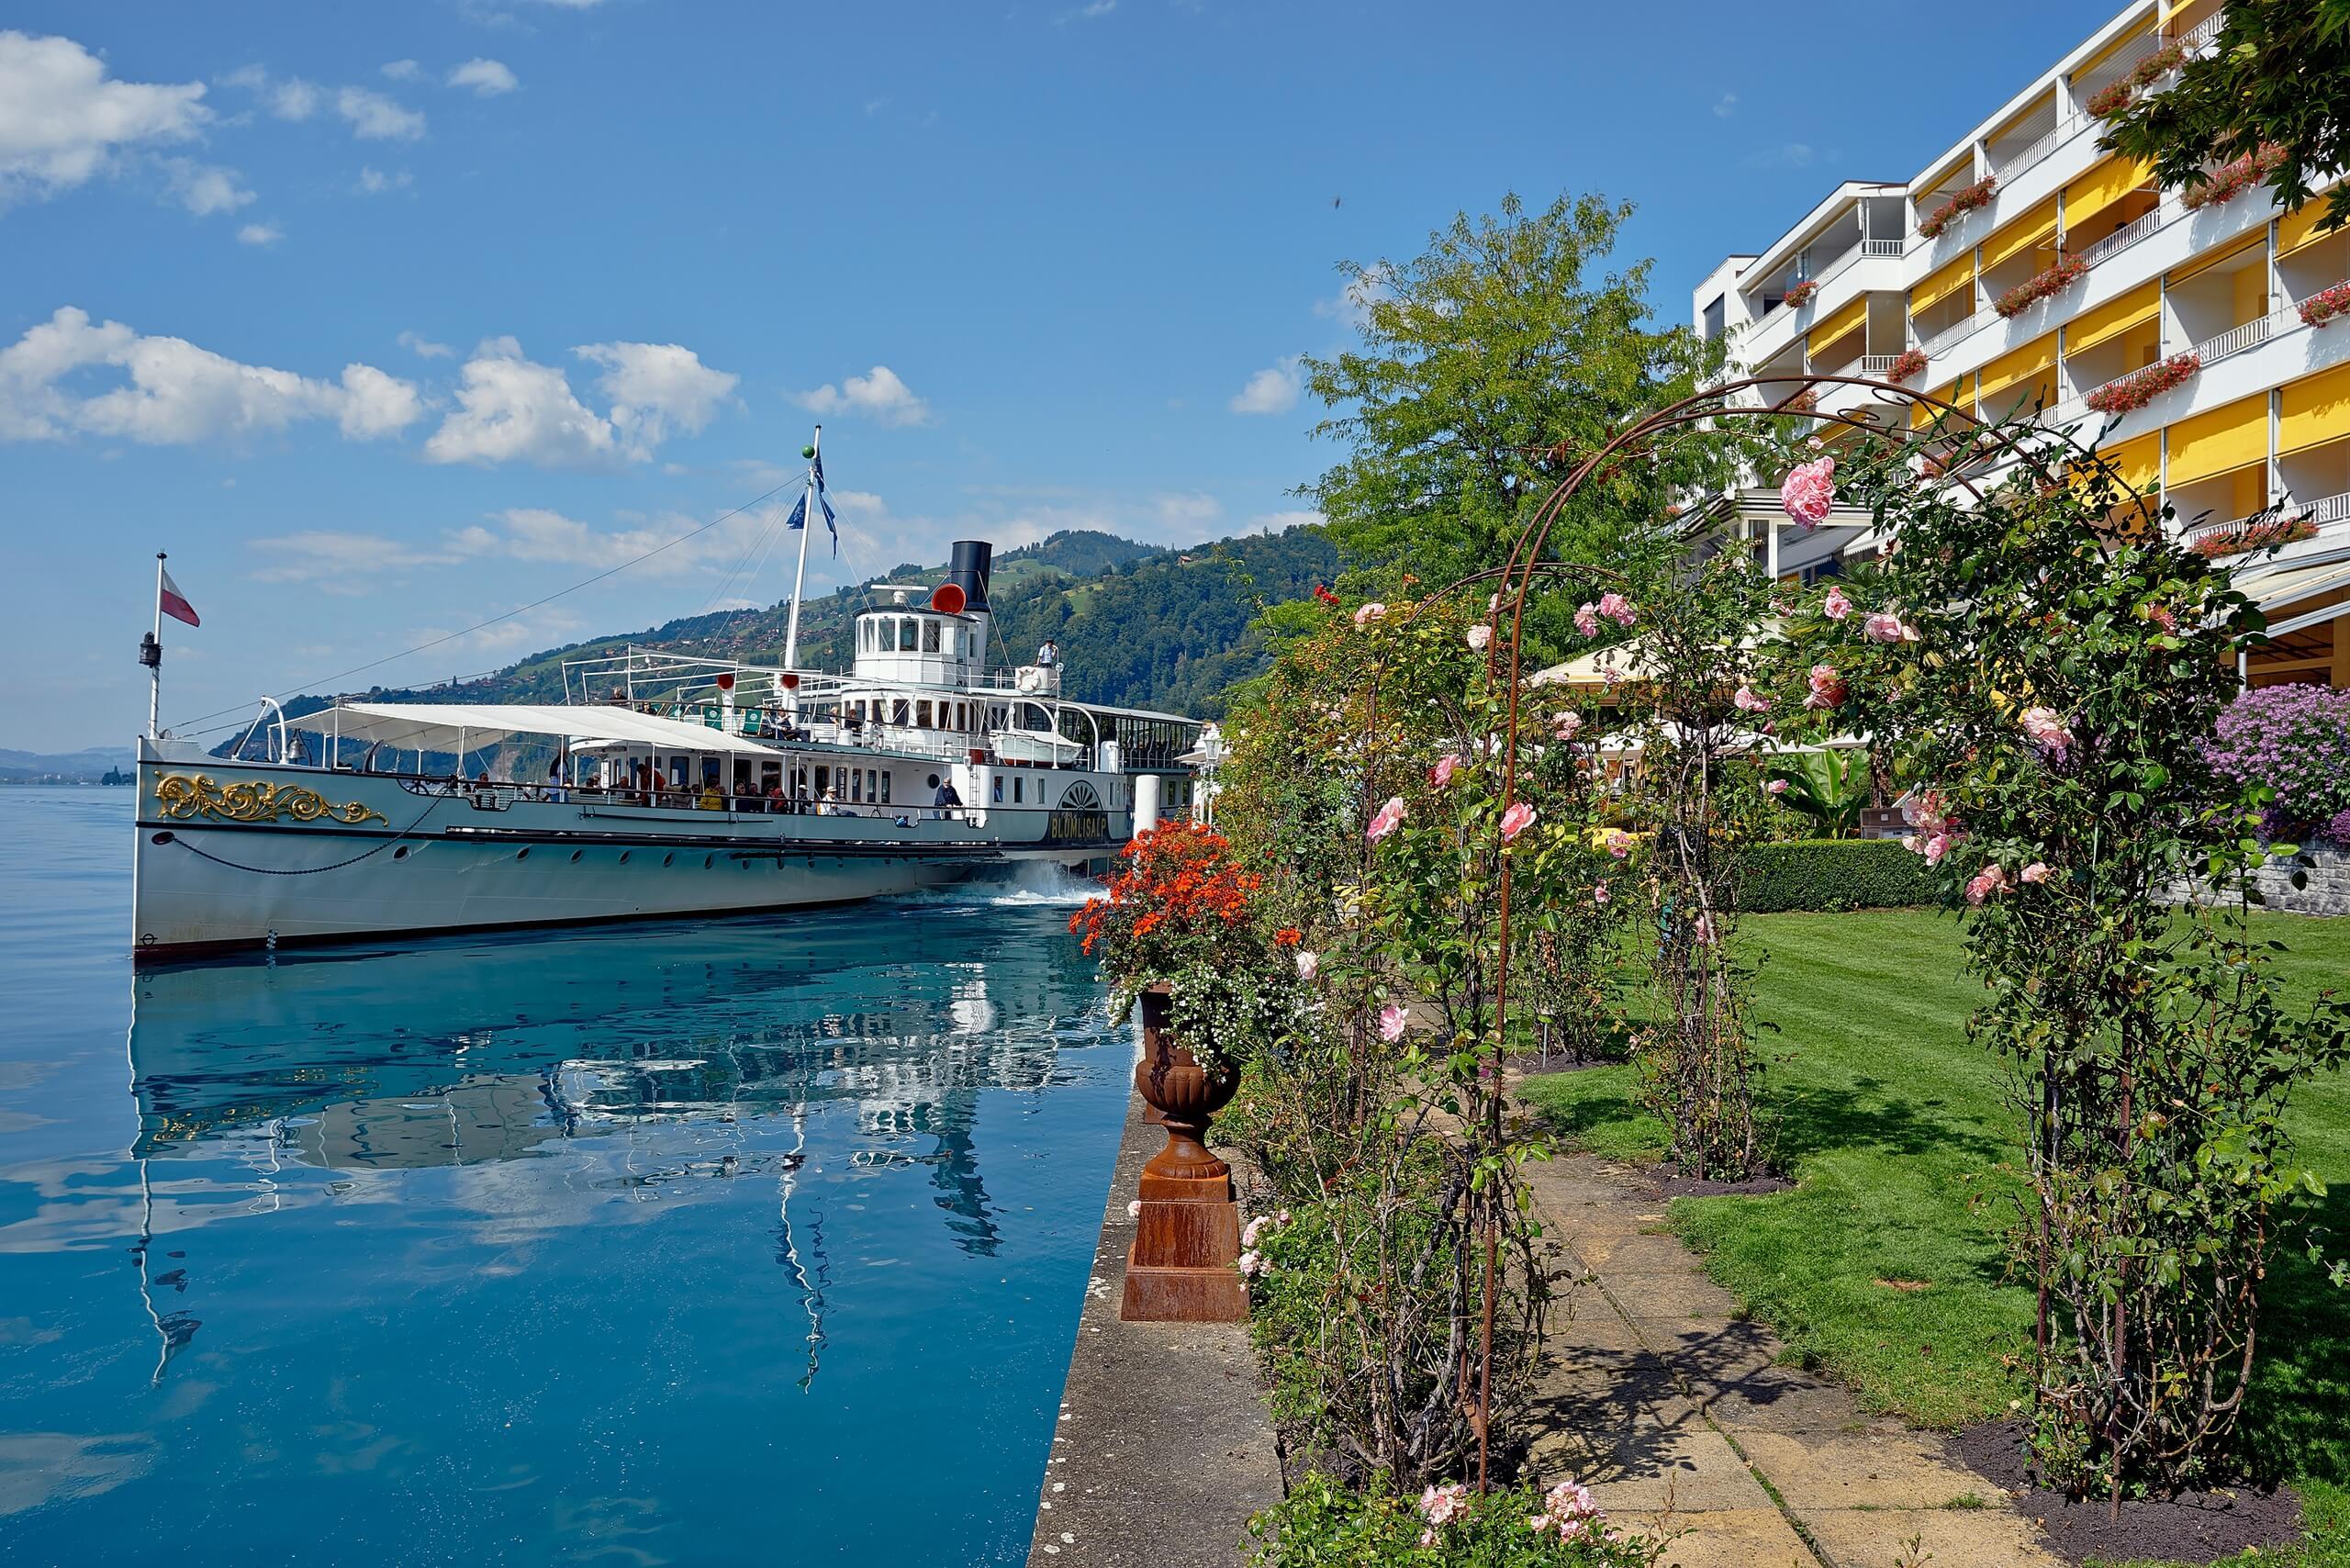 merligen-st-beatus-solbad-sommer-schiff